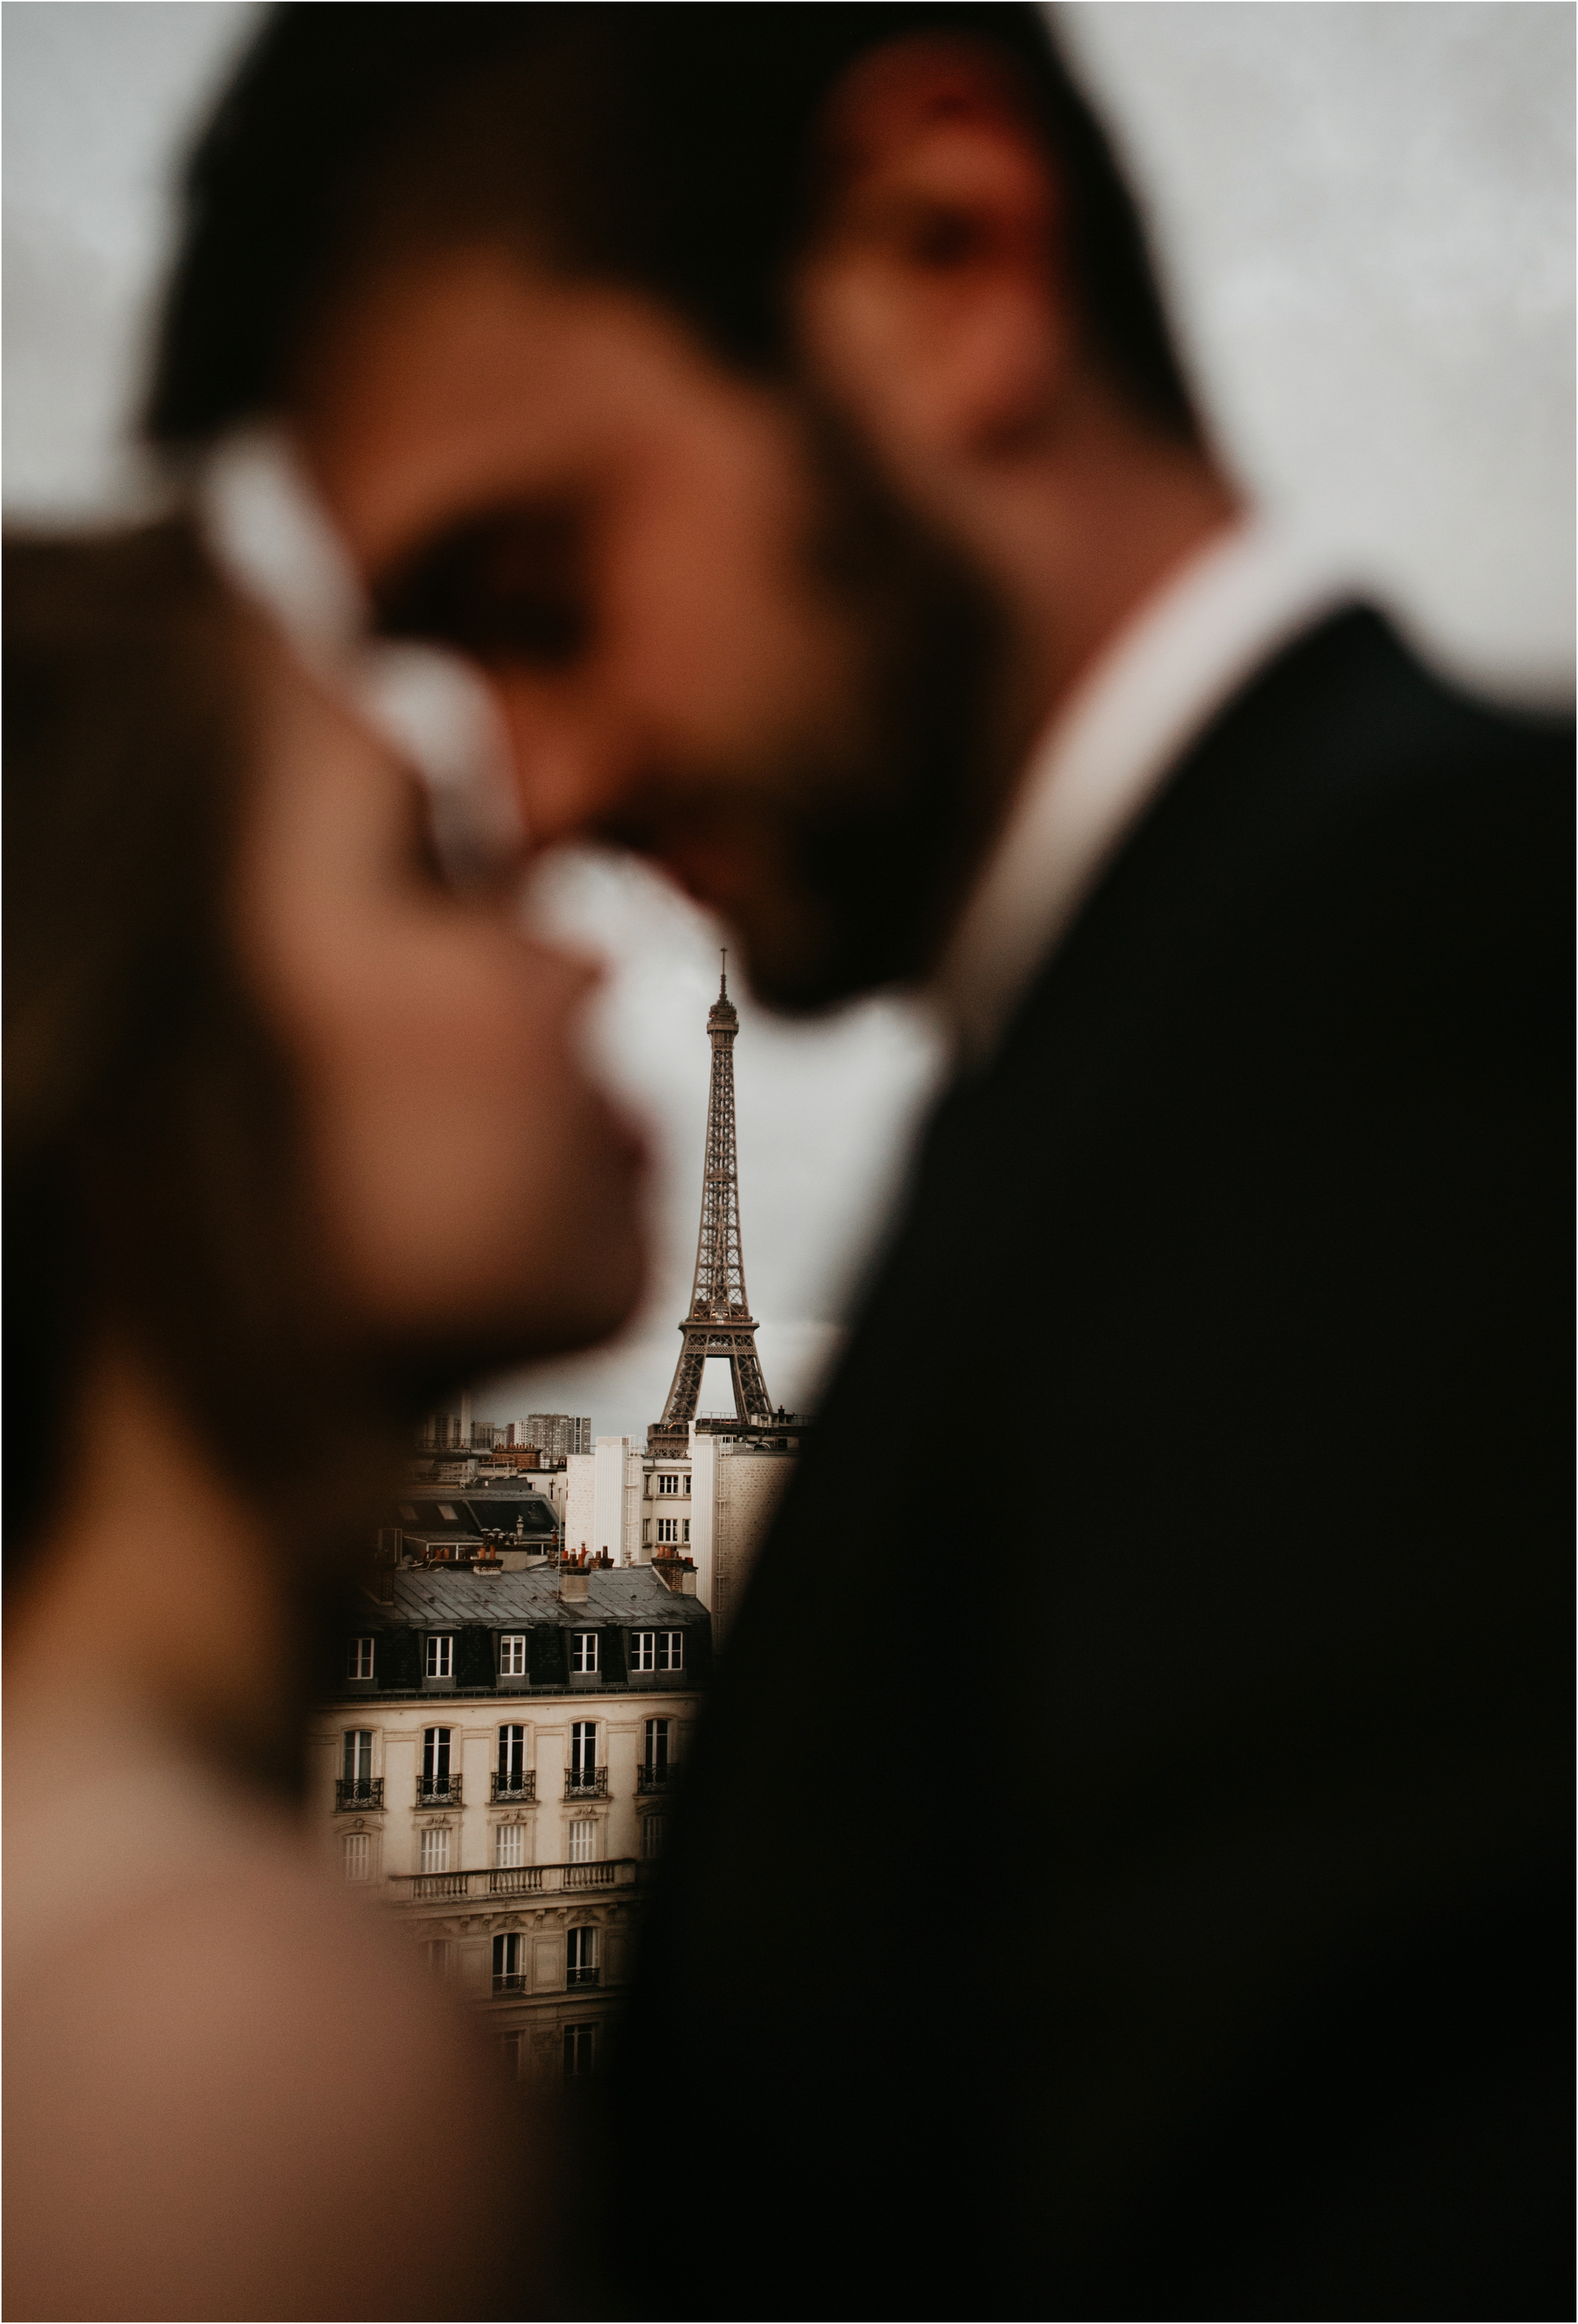 miranda-and-jared-paris-elopement-destination-wedding-photographer-023.jpg